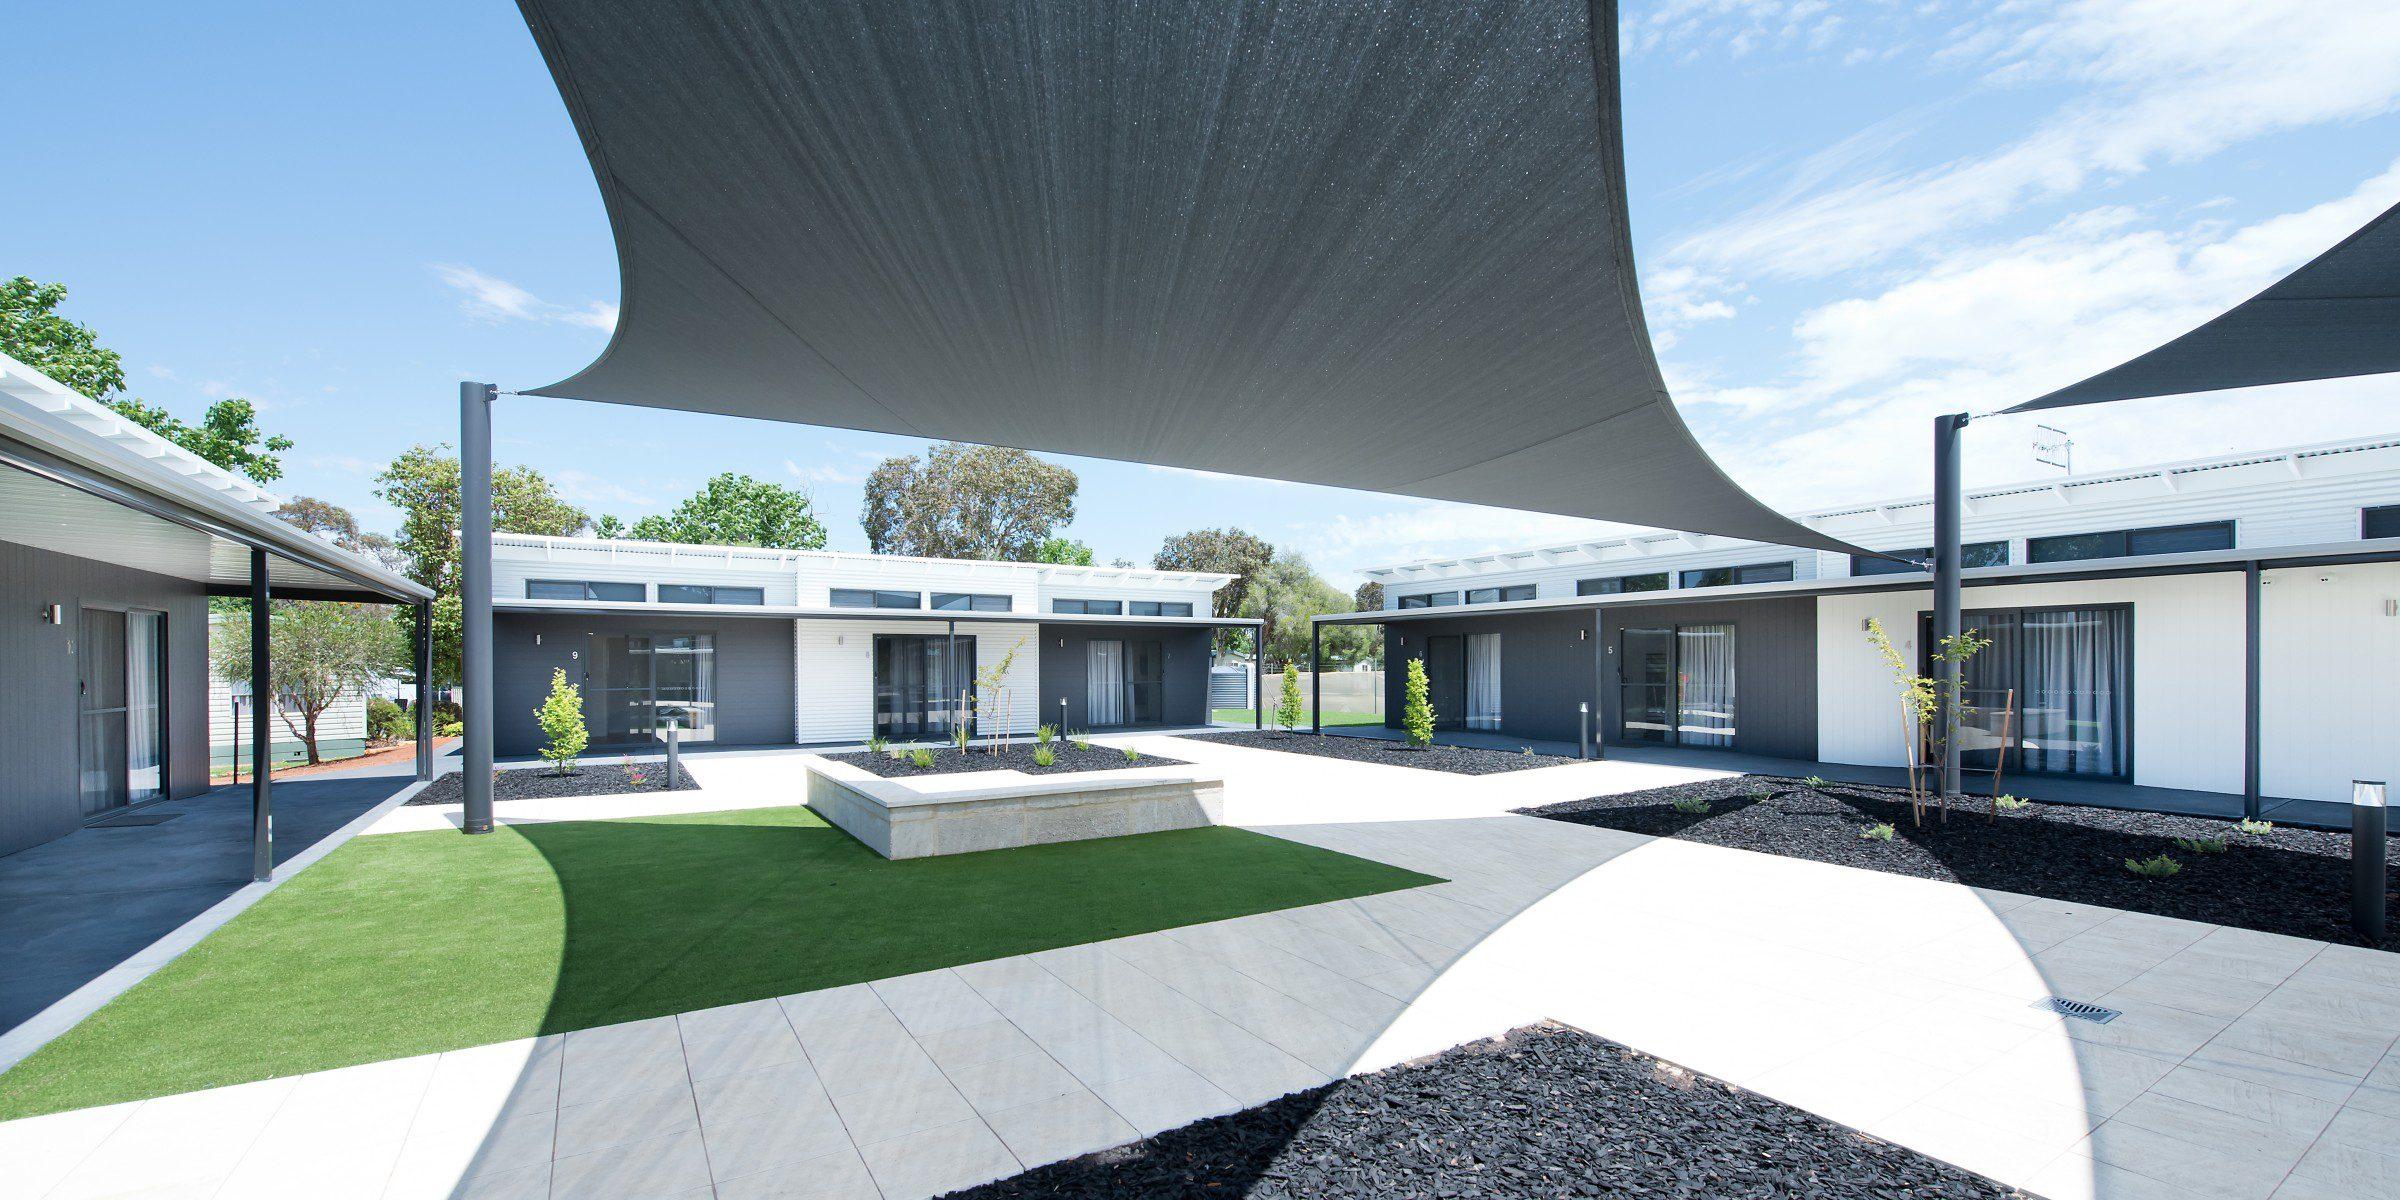 Photo of architecturally designed project at Berri Riverside Holiday Park, Berri